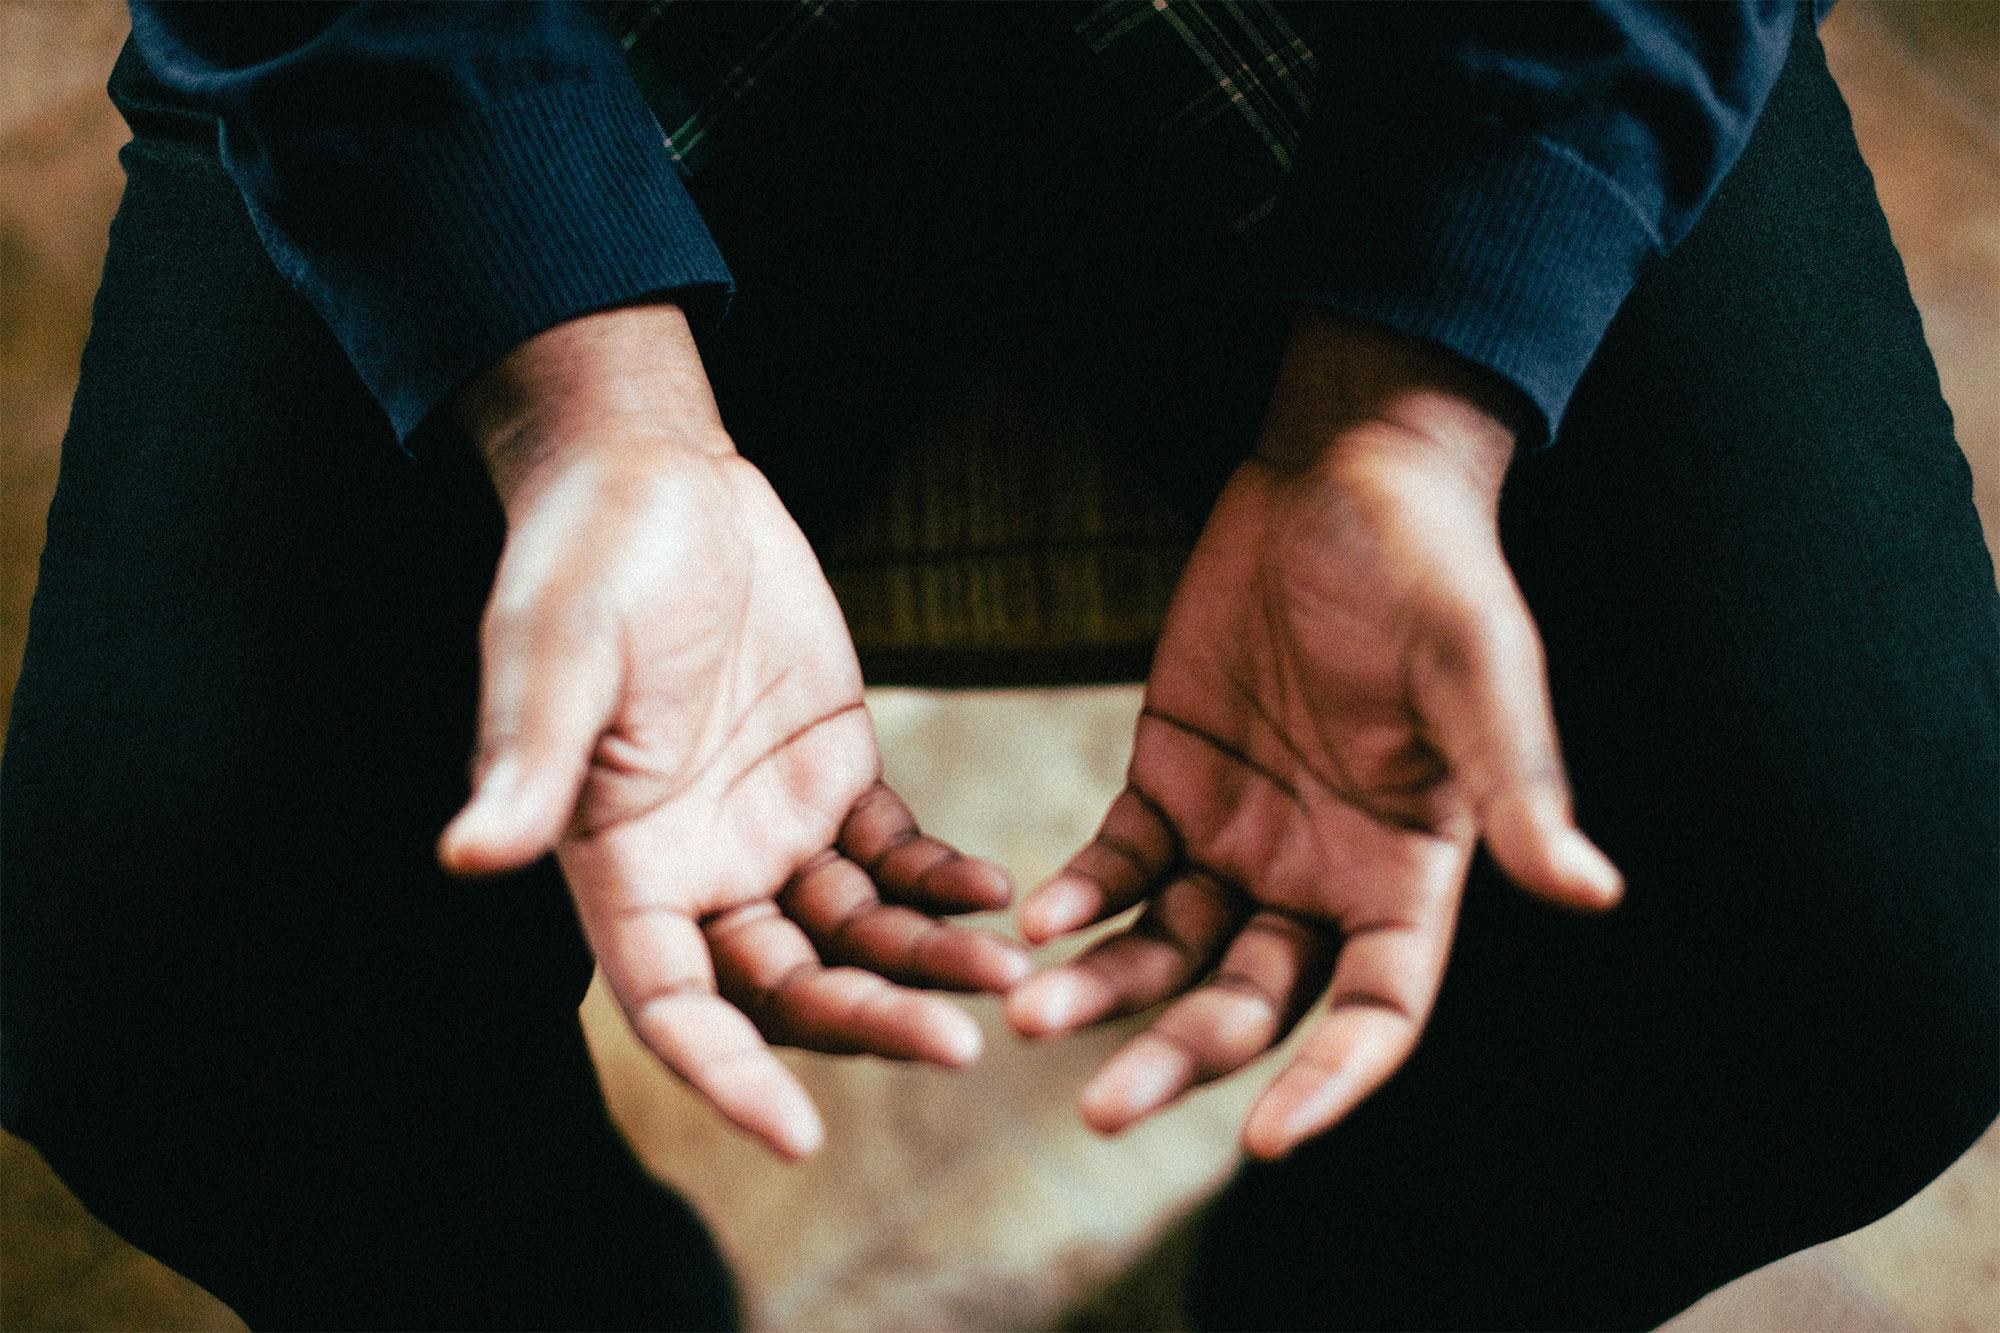 reumatism symtom höft